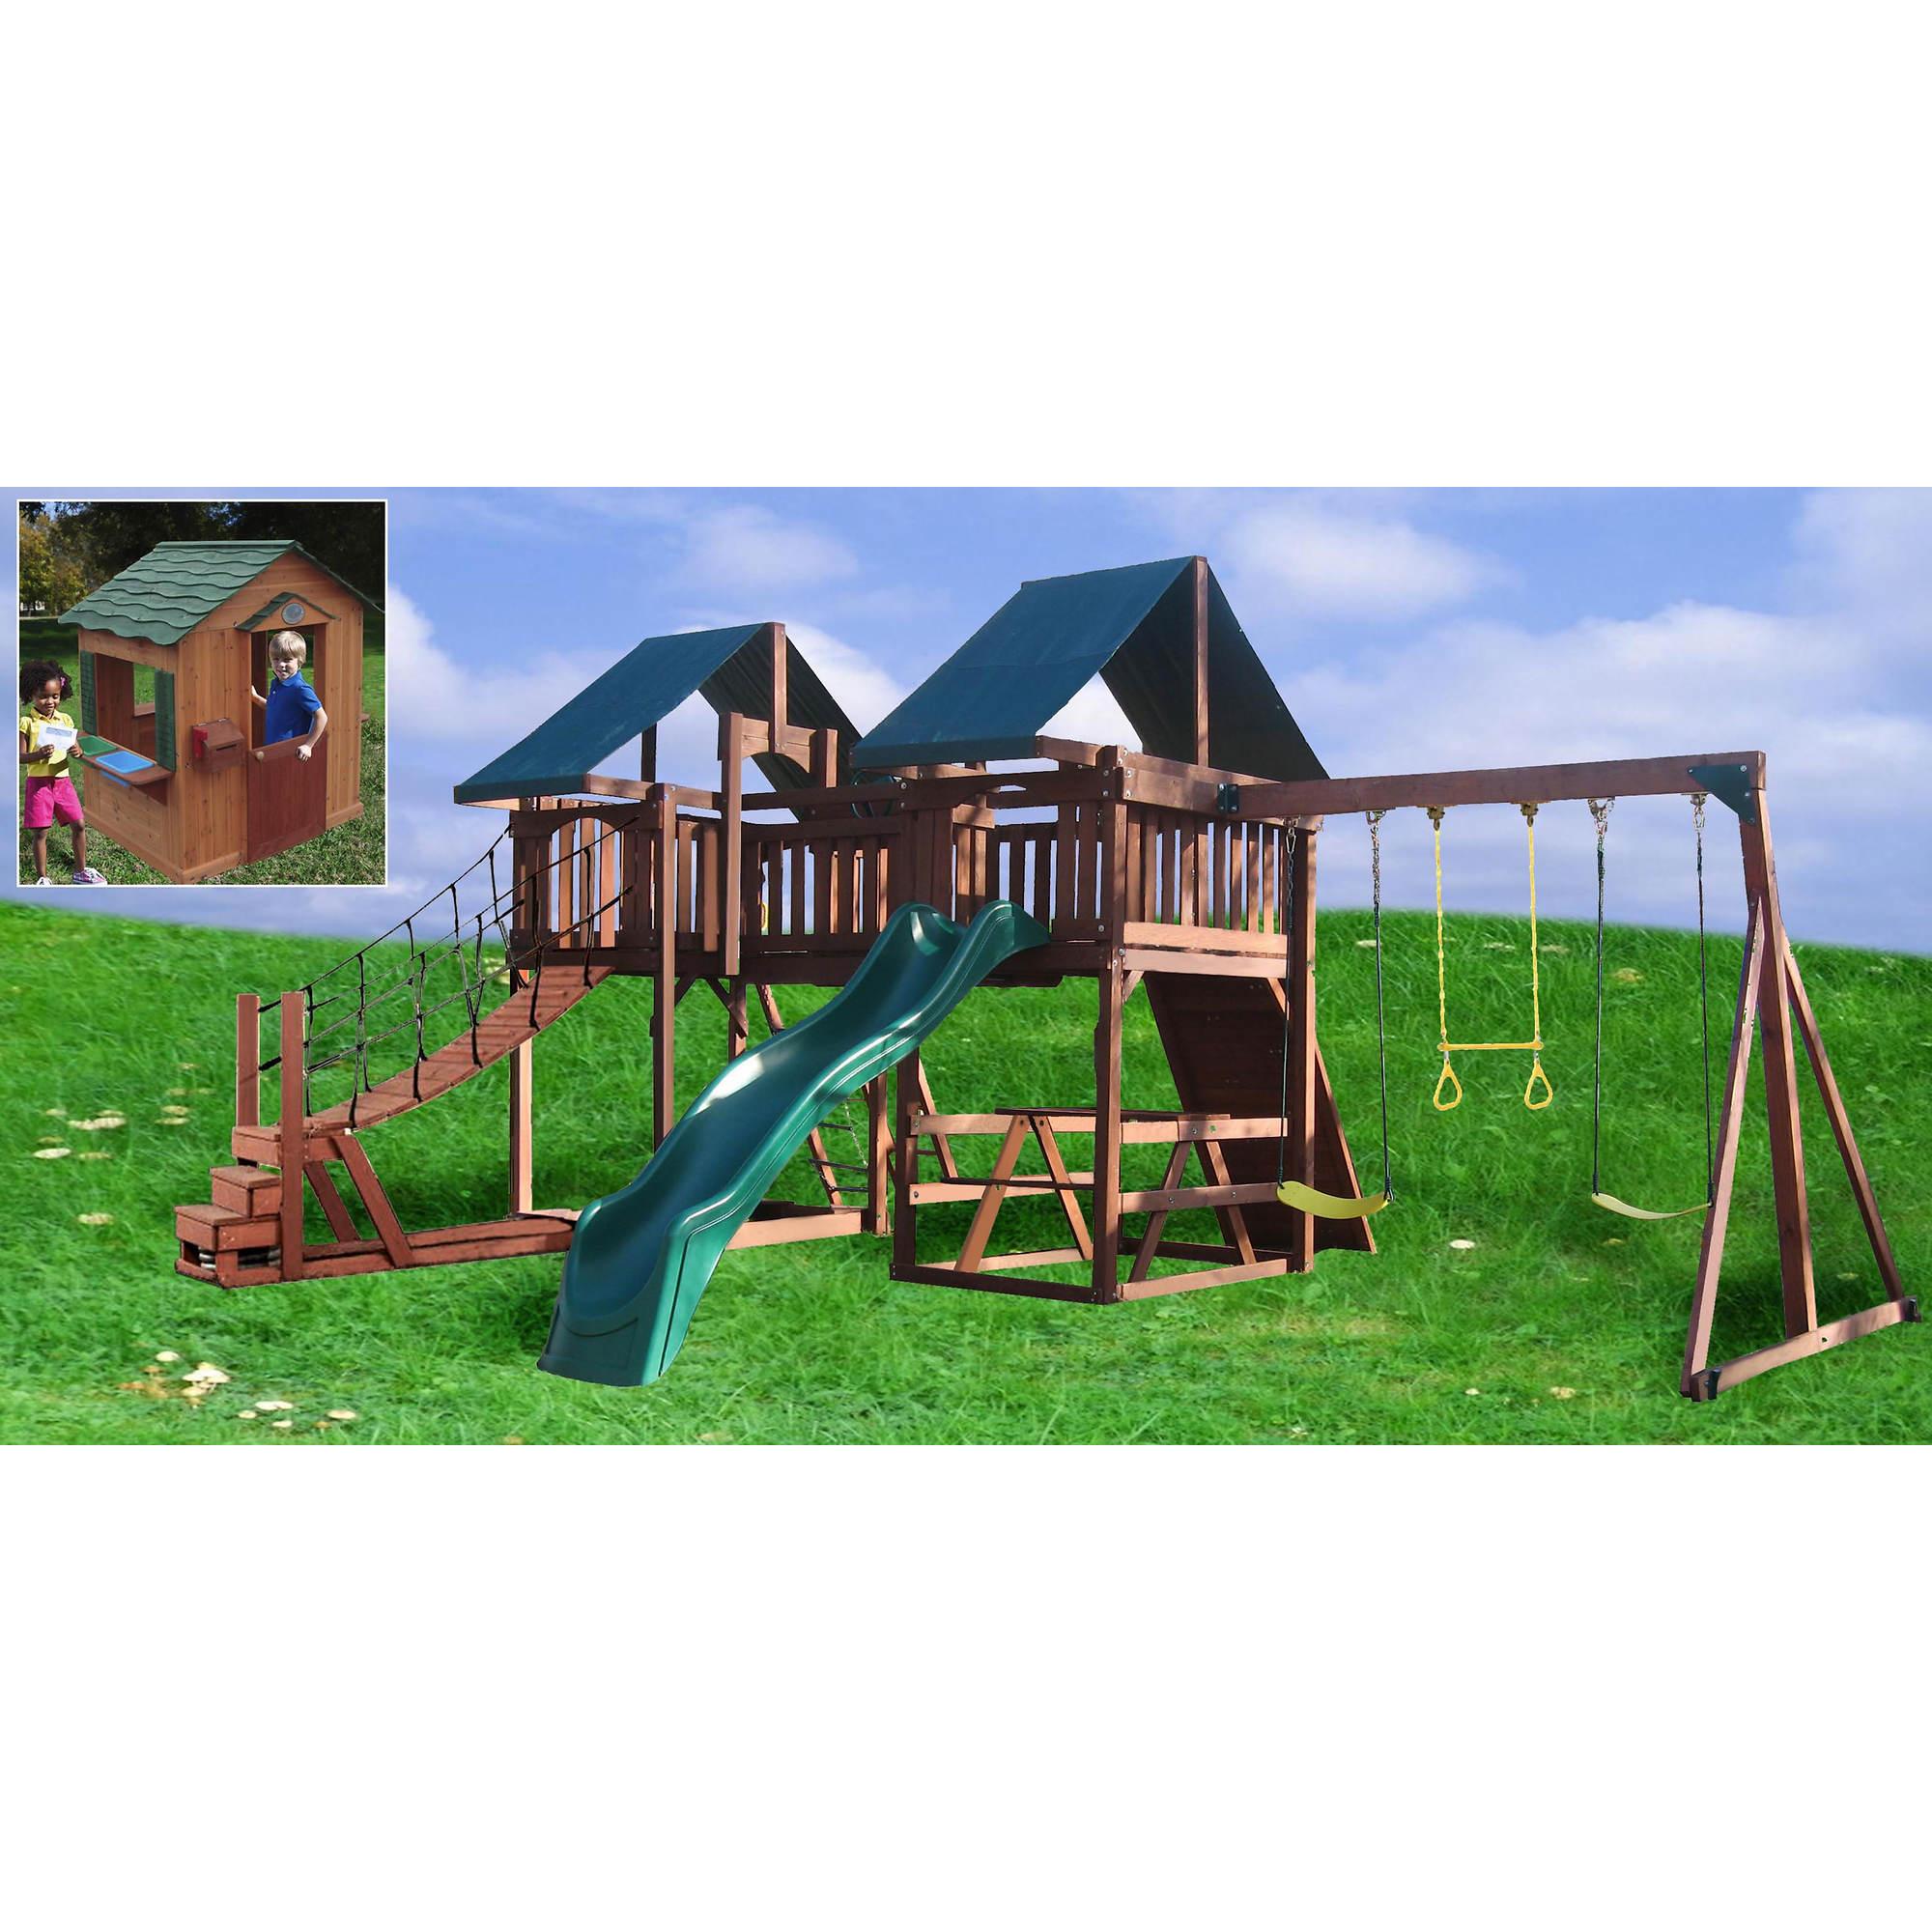 malibu rgb swings set shipping swing paradise price gorilla lifestyle for kids lowest free p playset